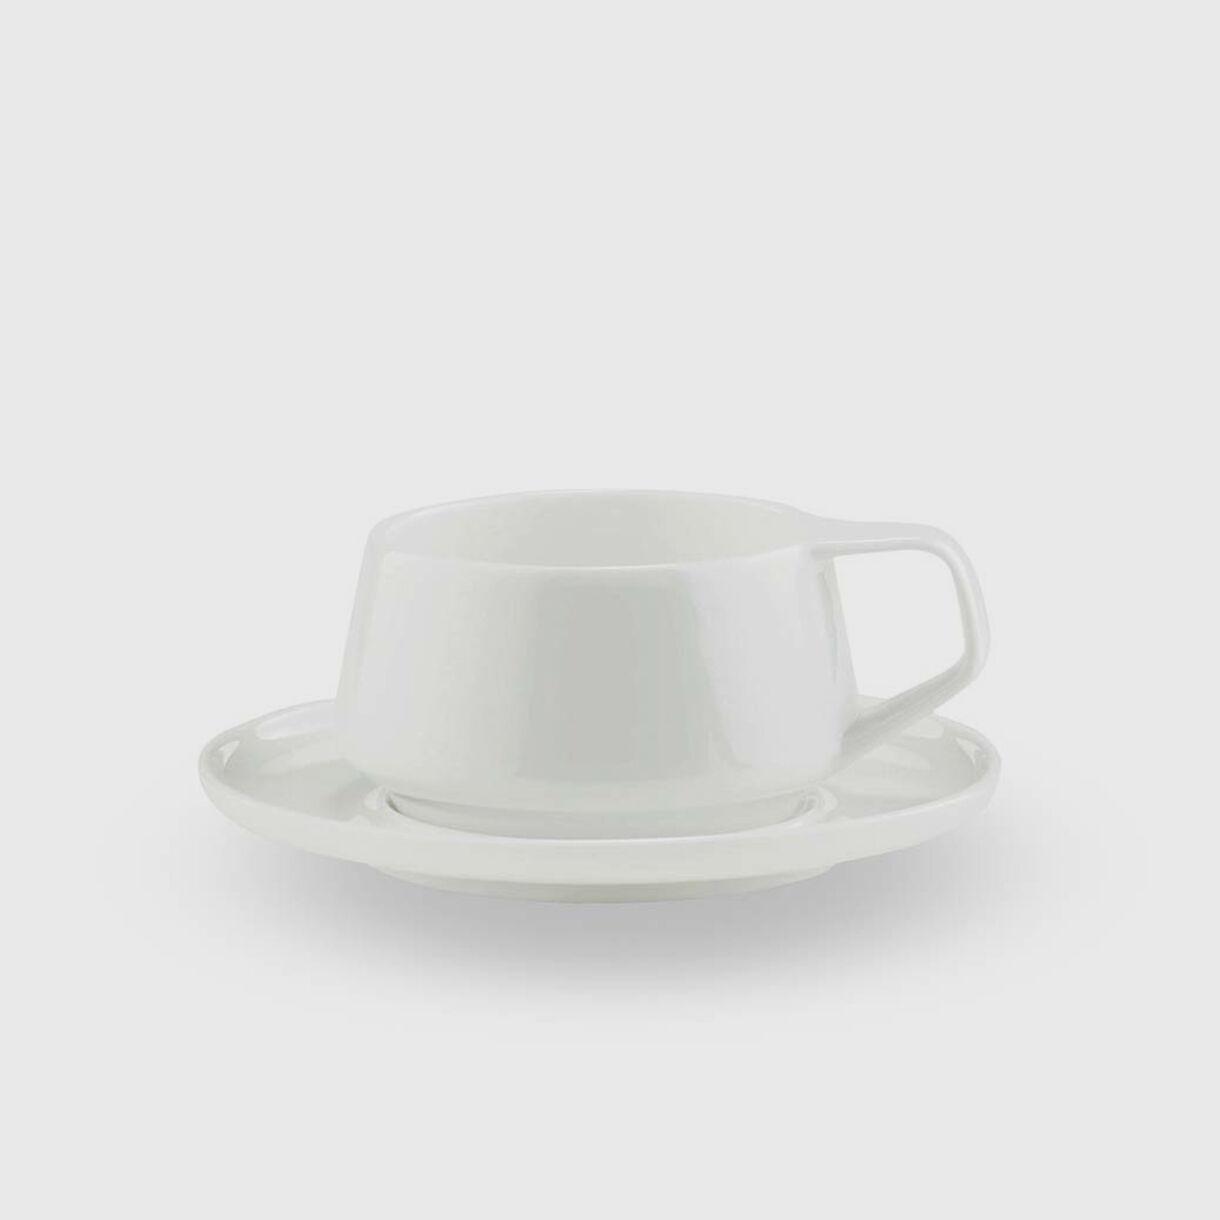 Mark Newson by Noritake Cup & Saucer Set